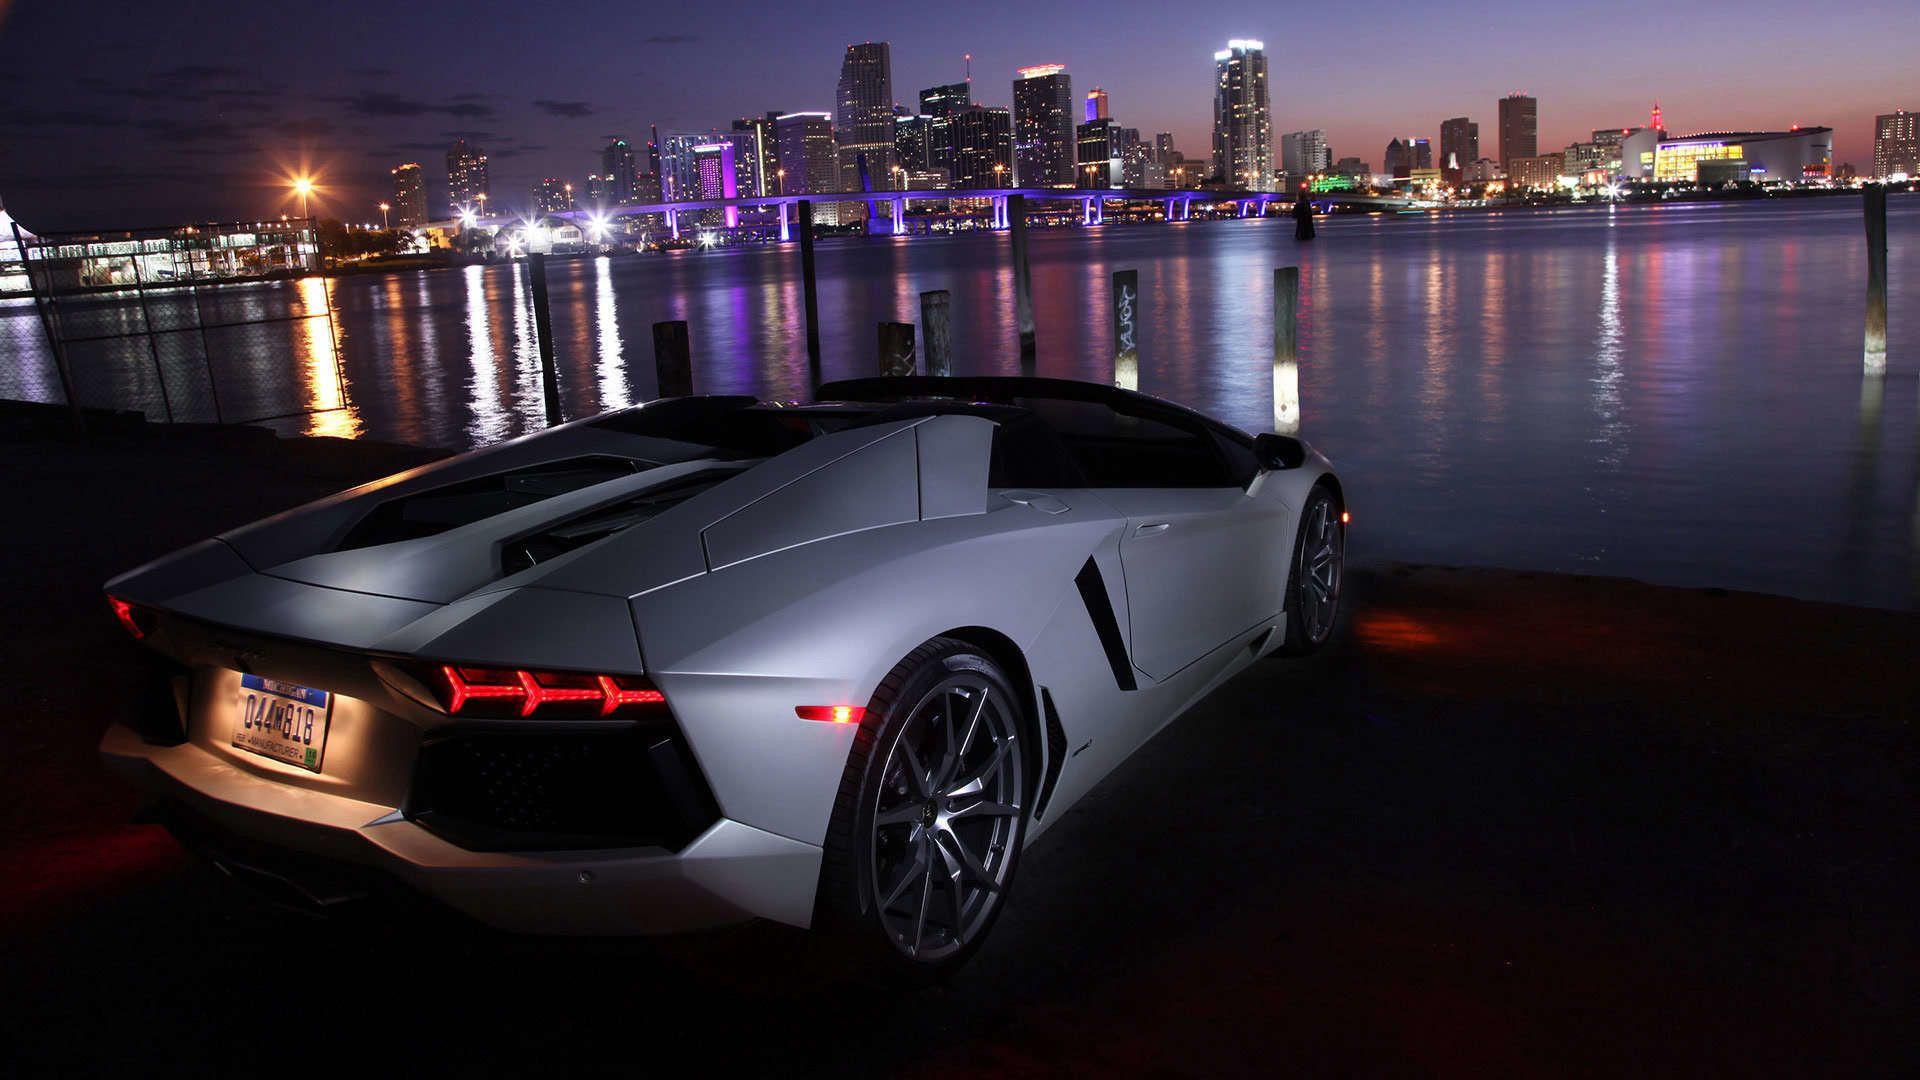 1920x1080 1920x1080 Lamborghini Wallpaper 1080p Wallpapersafari